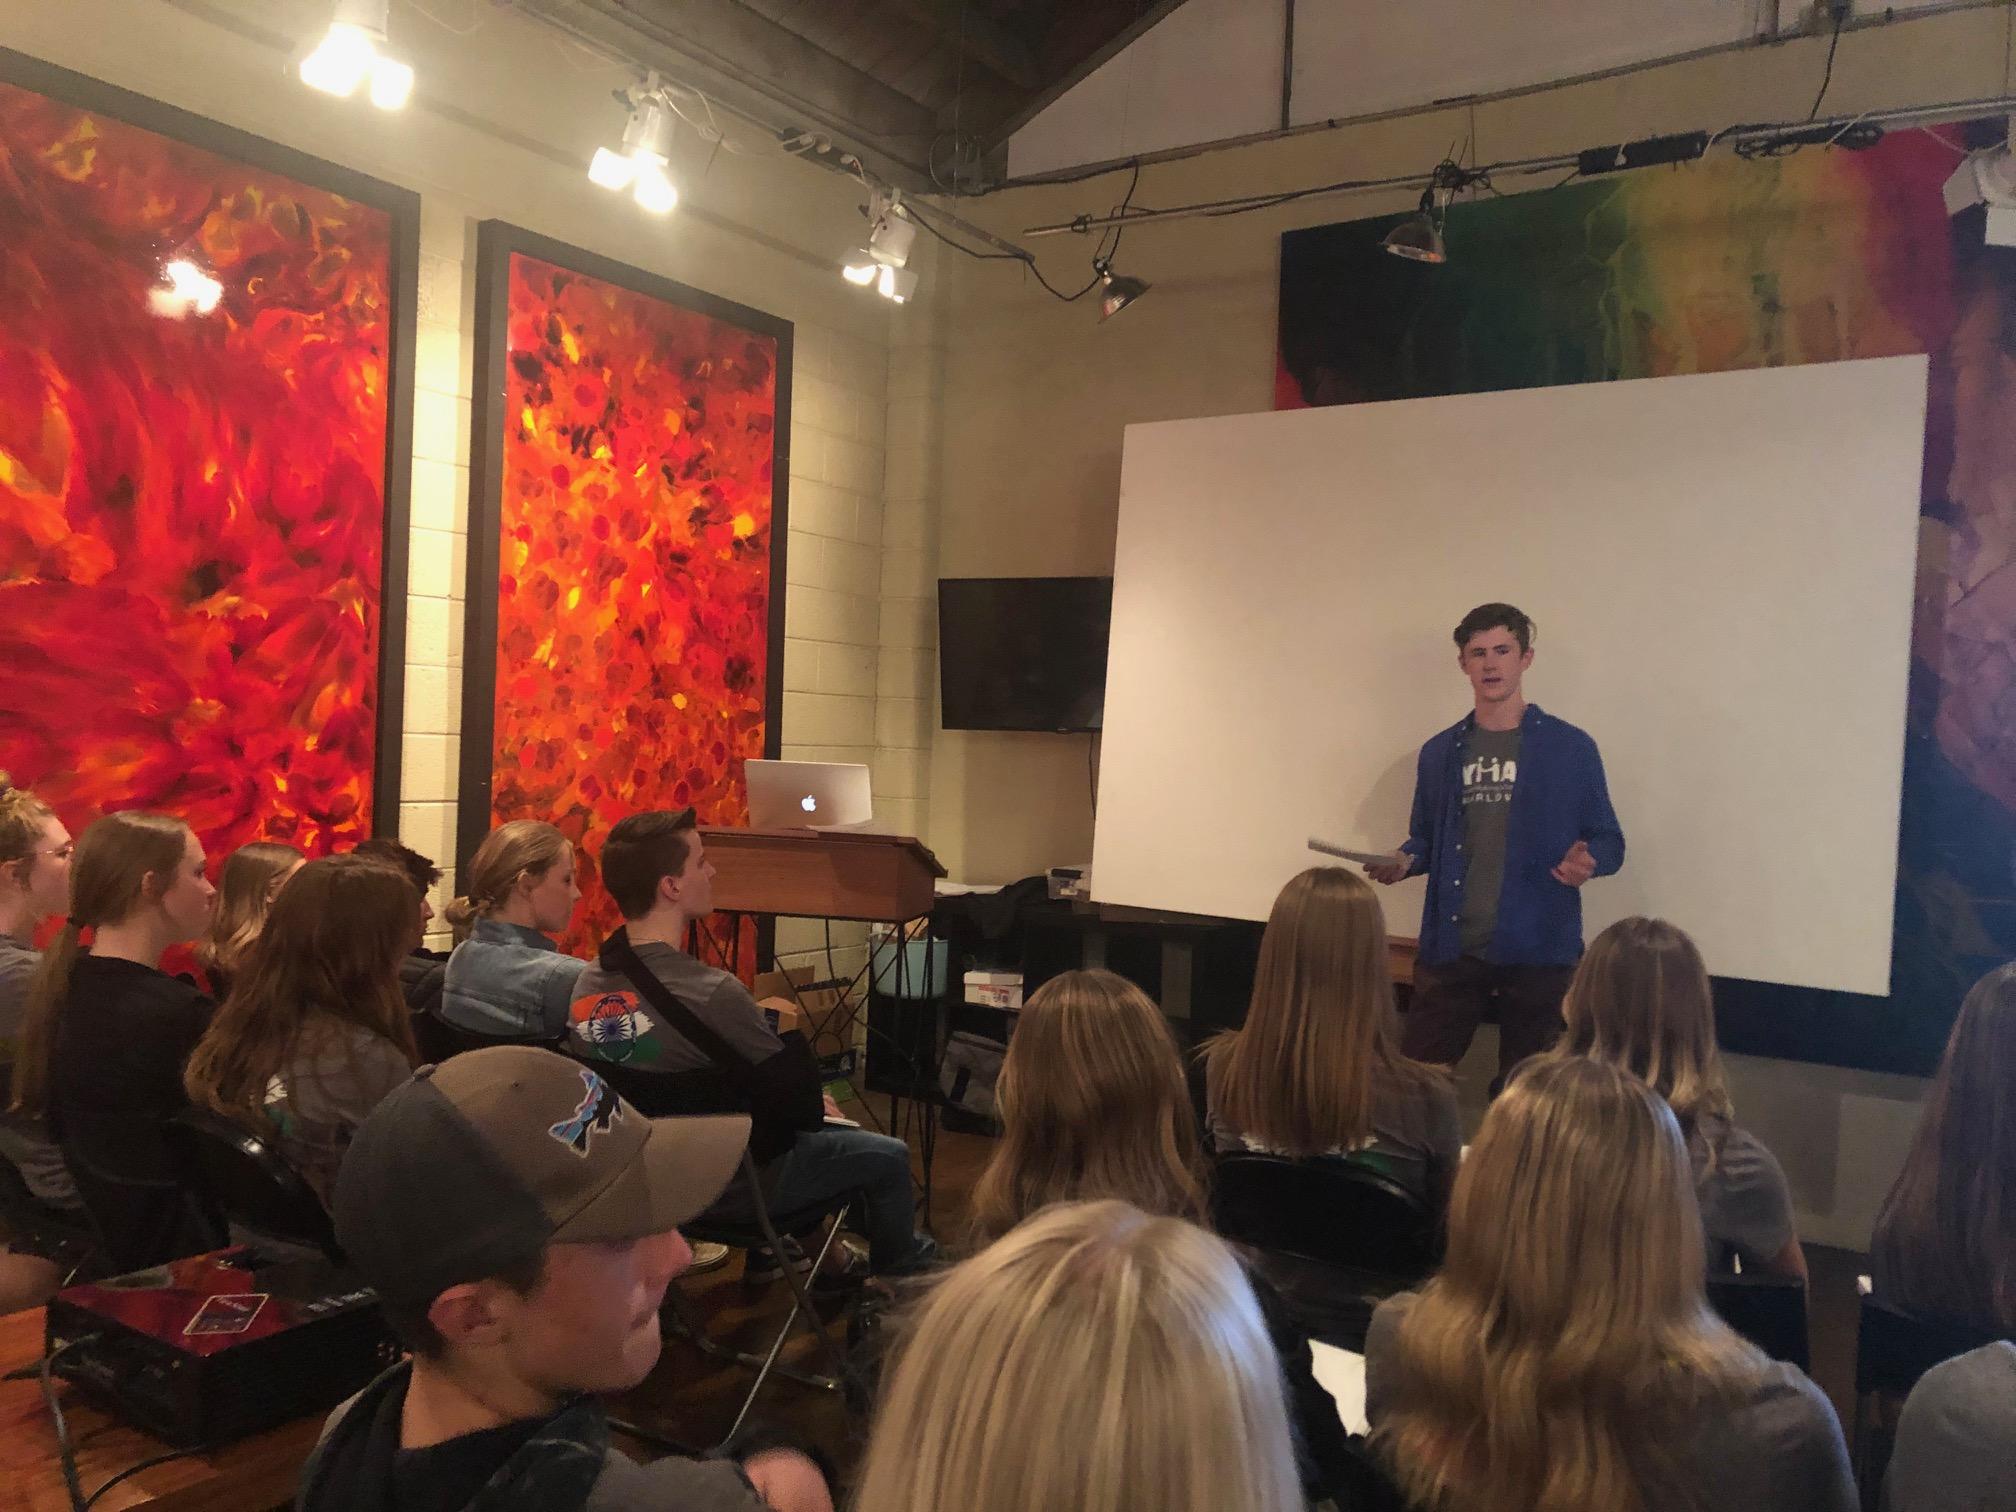 Sumner sharing his TED talk